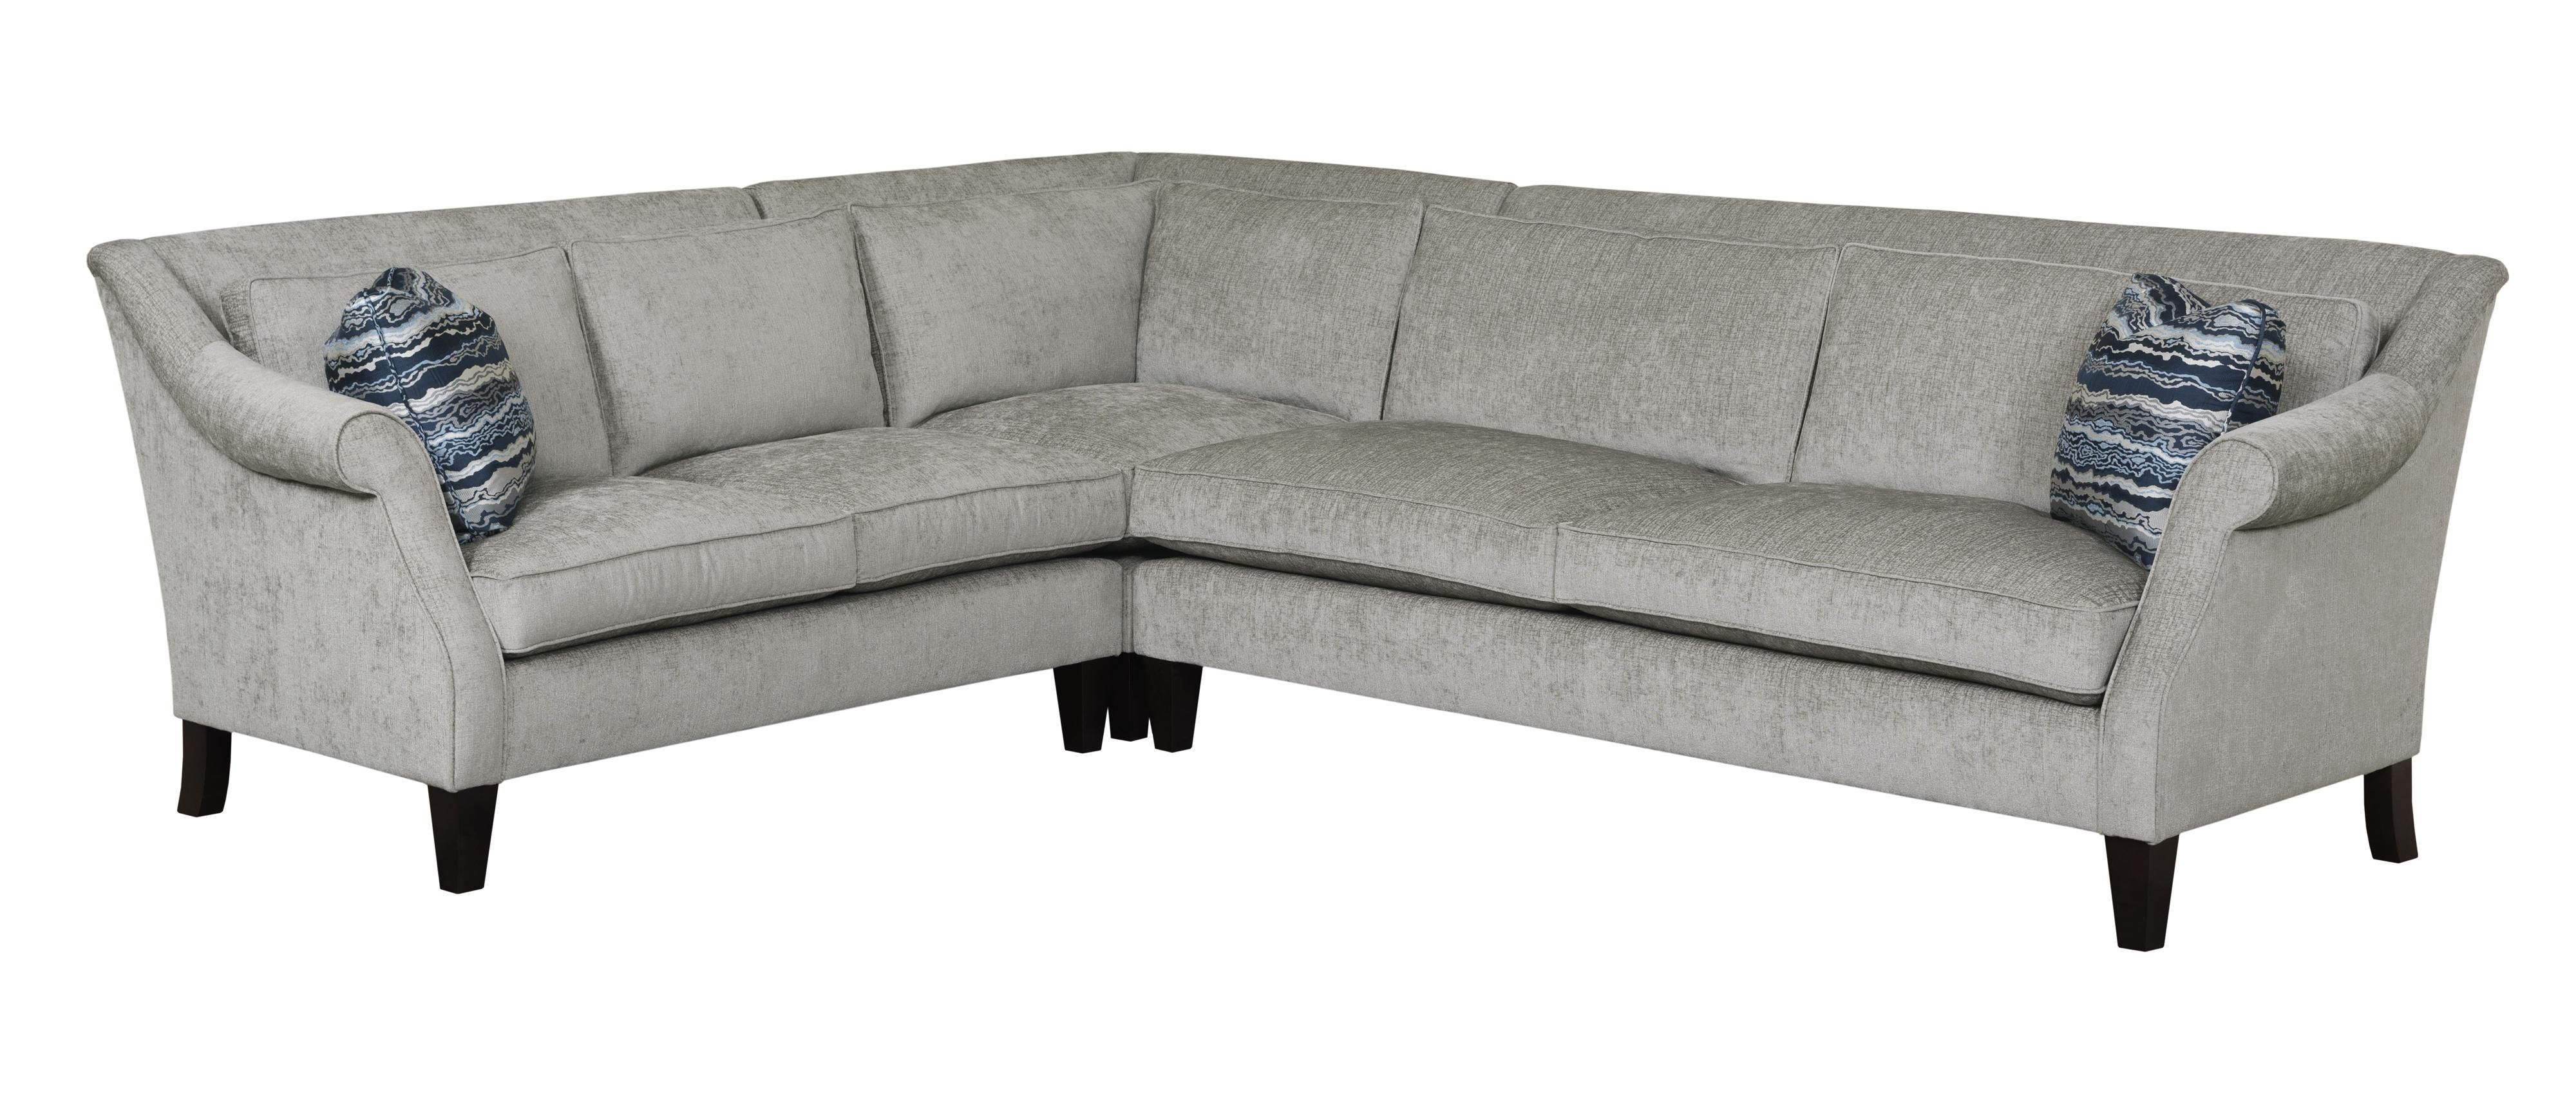 sofa classic billy baldwin tuxedo gray l shaped sectional design ideas for